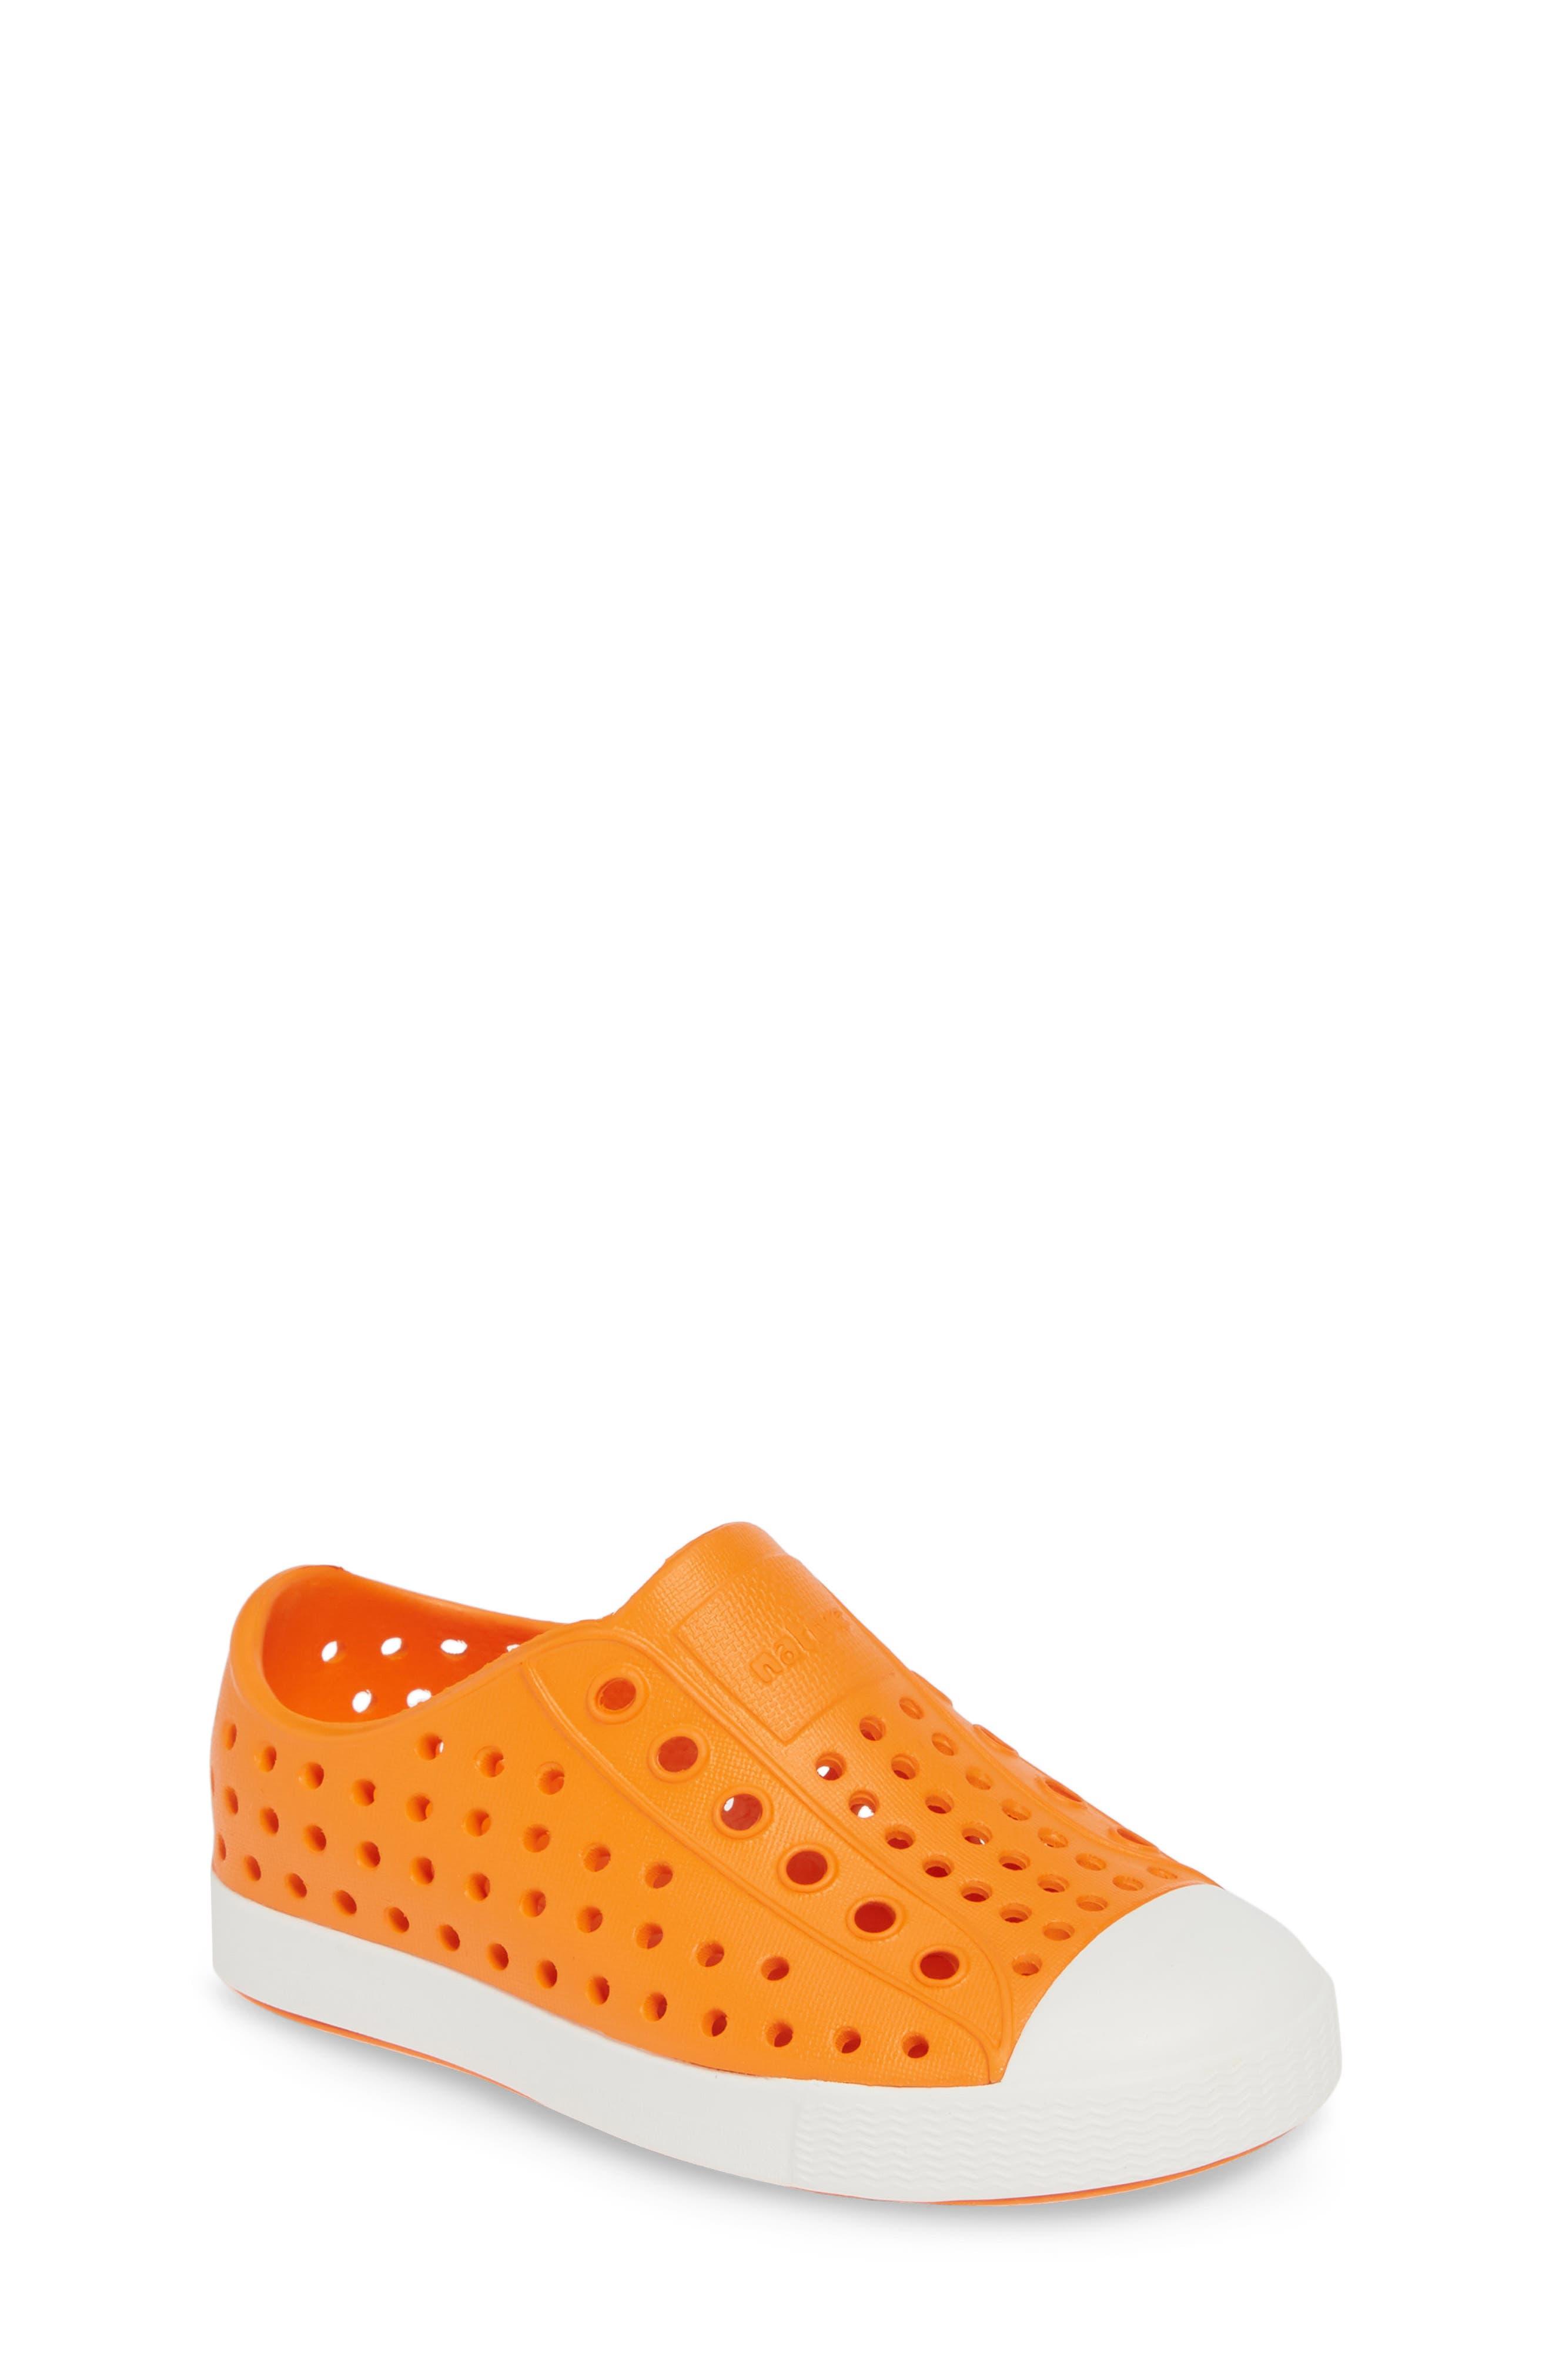 New Mens Leather Look Designer Inspired Slip On Shoes Brown White Black Sz 7-12